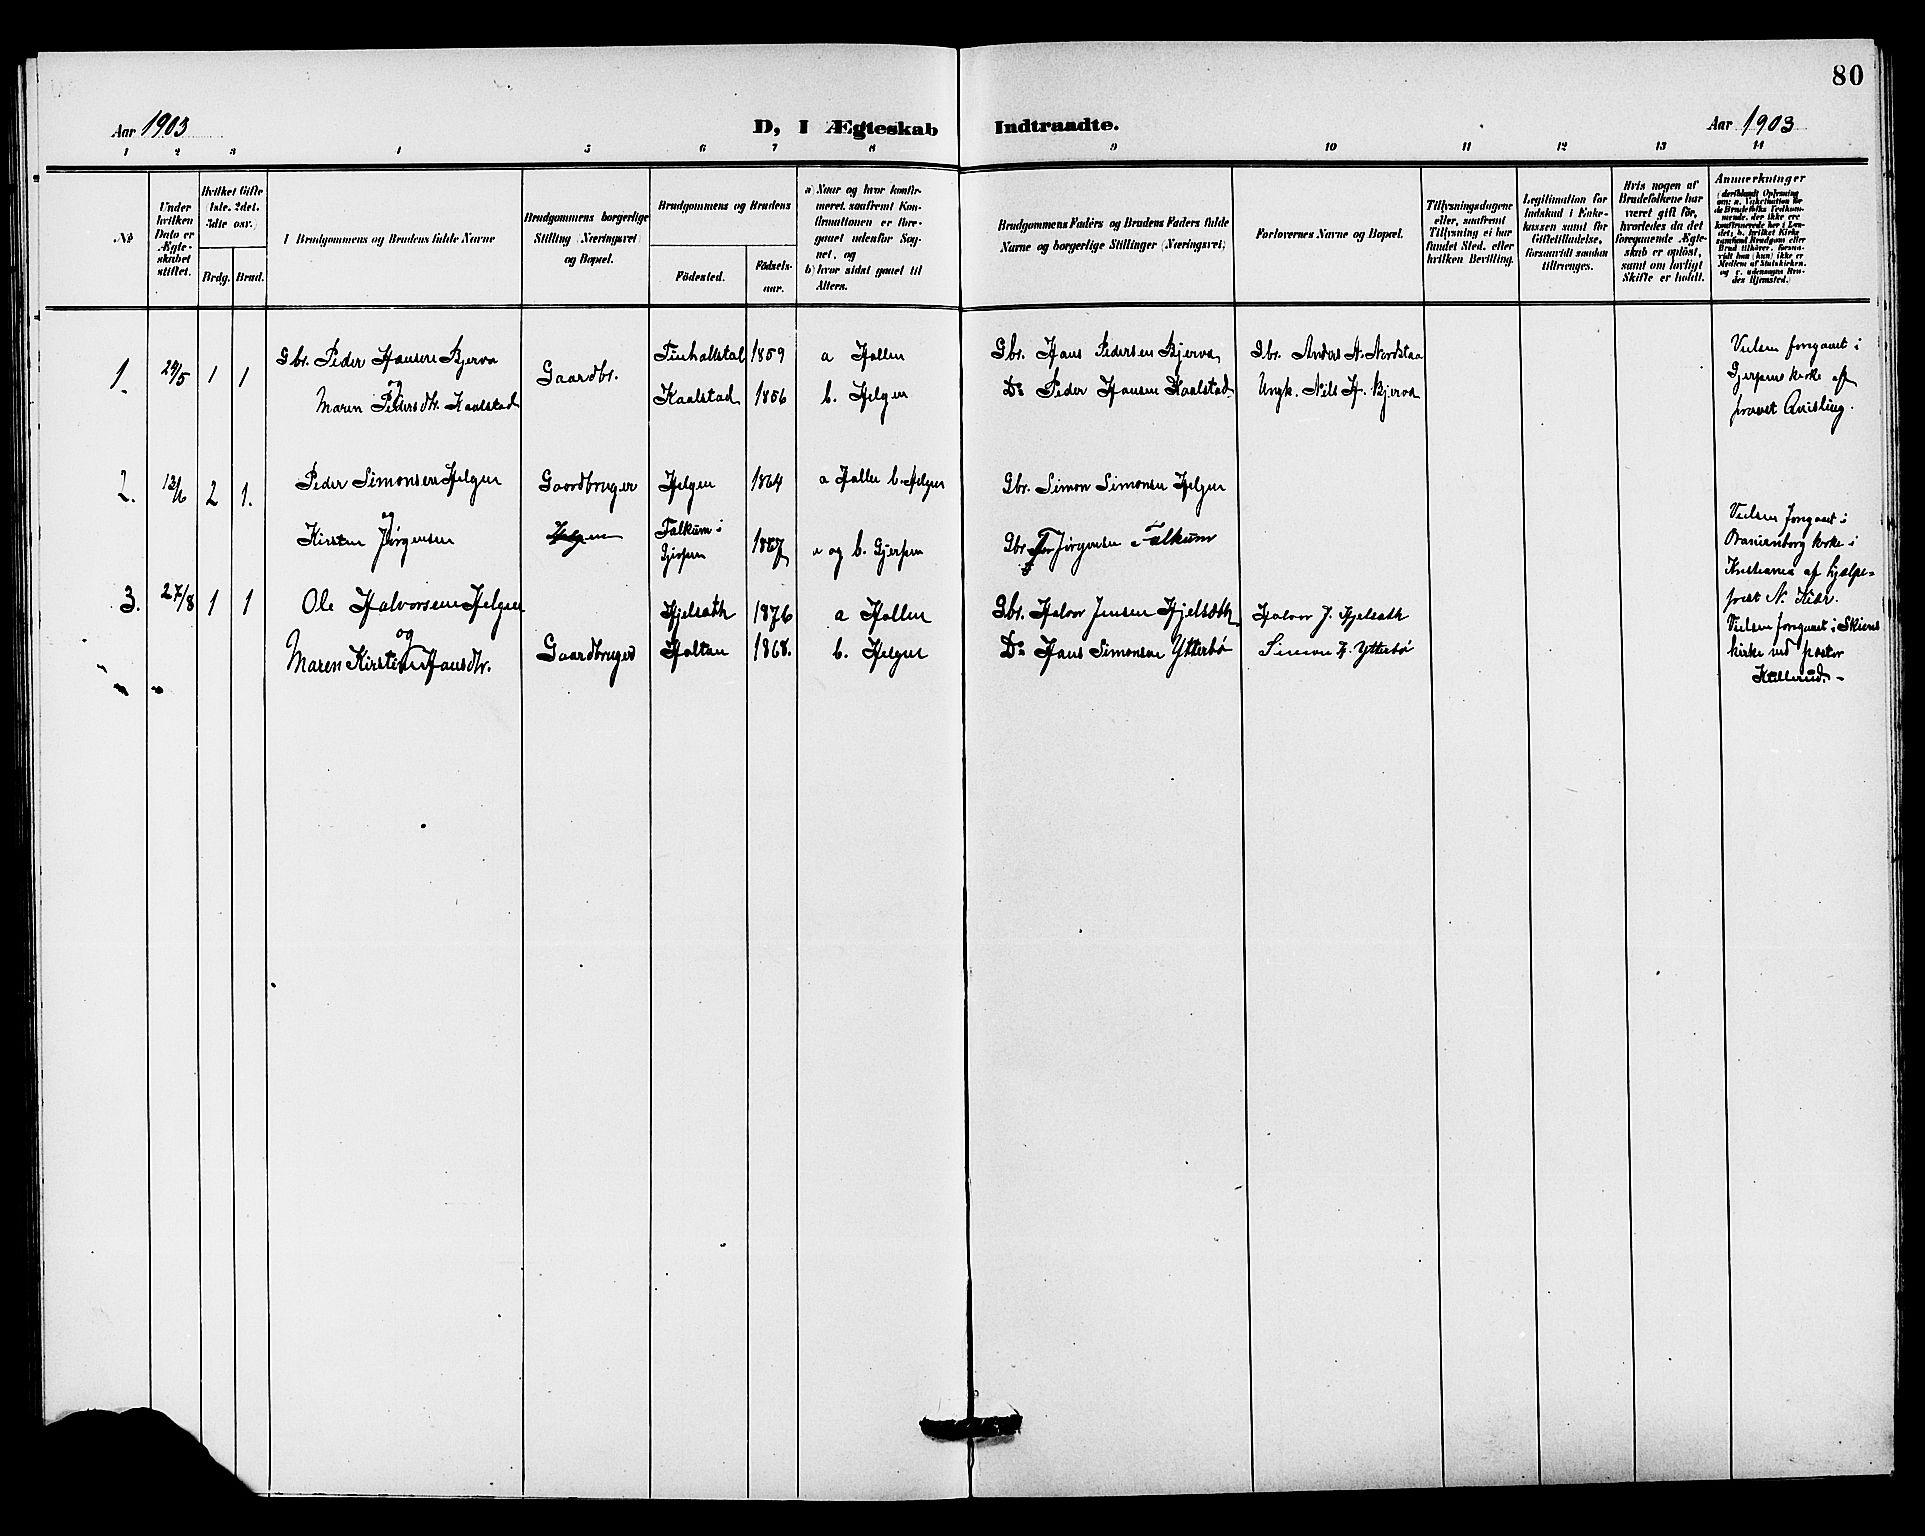 SAKO, Holla kirkebøker, G/Gb/L0002: Klokkerbok nr. II 2, 1897-1913, s. 80